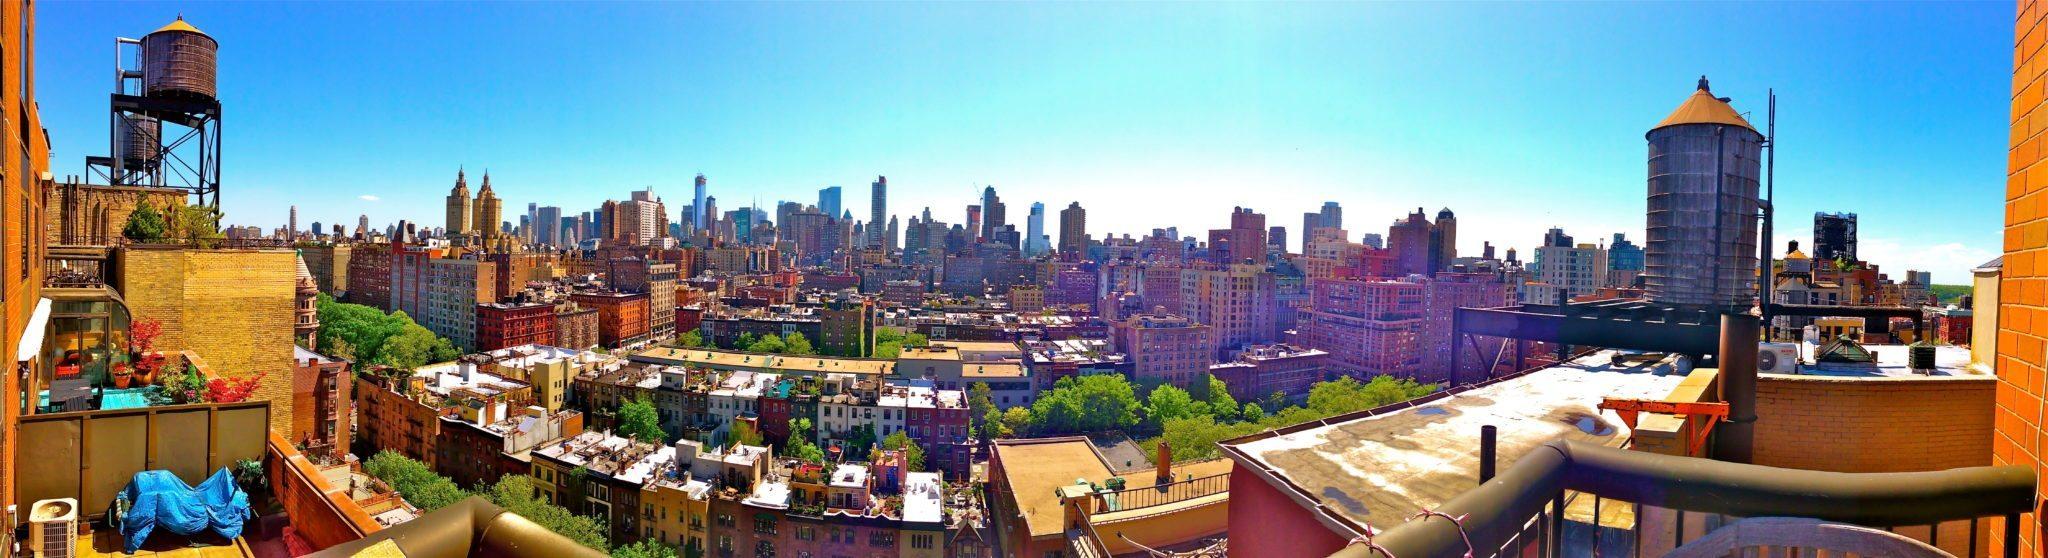 Upper West Side Hotel New York